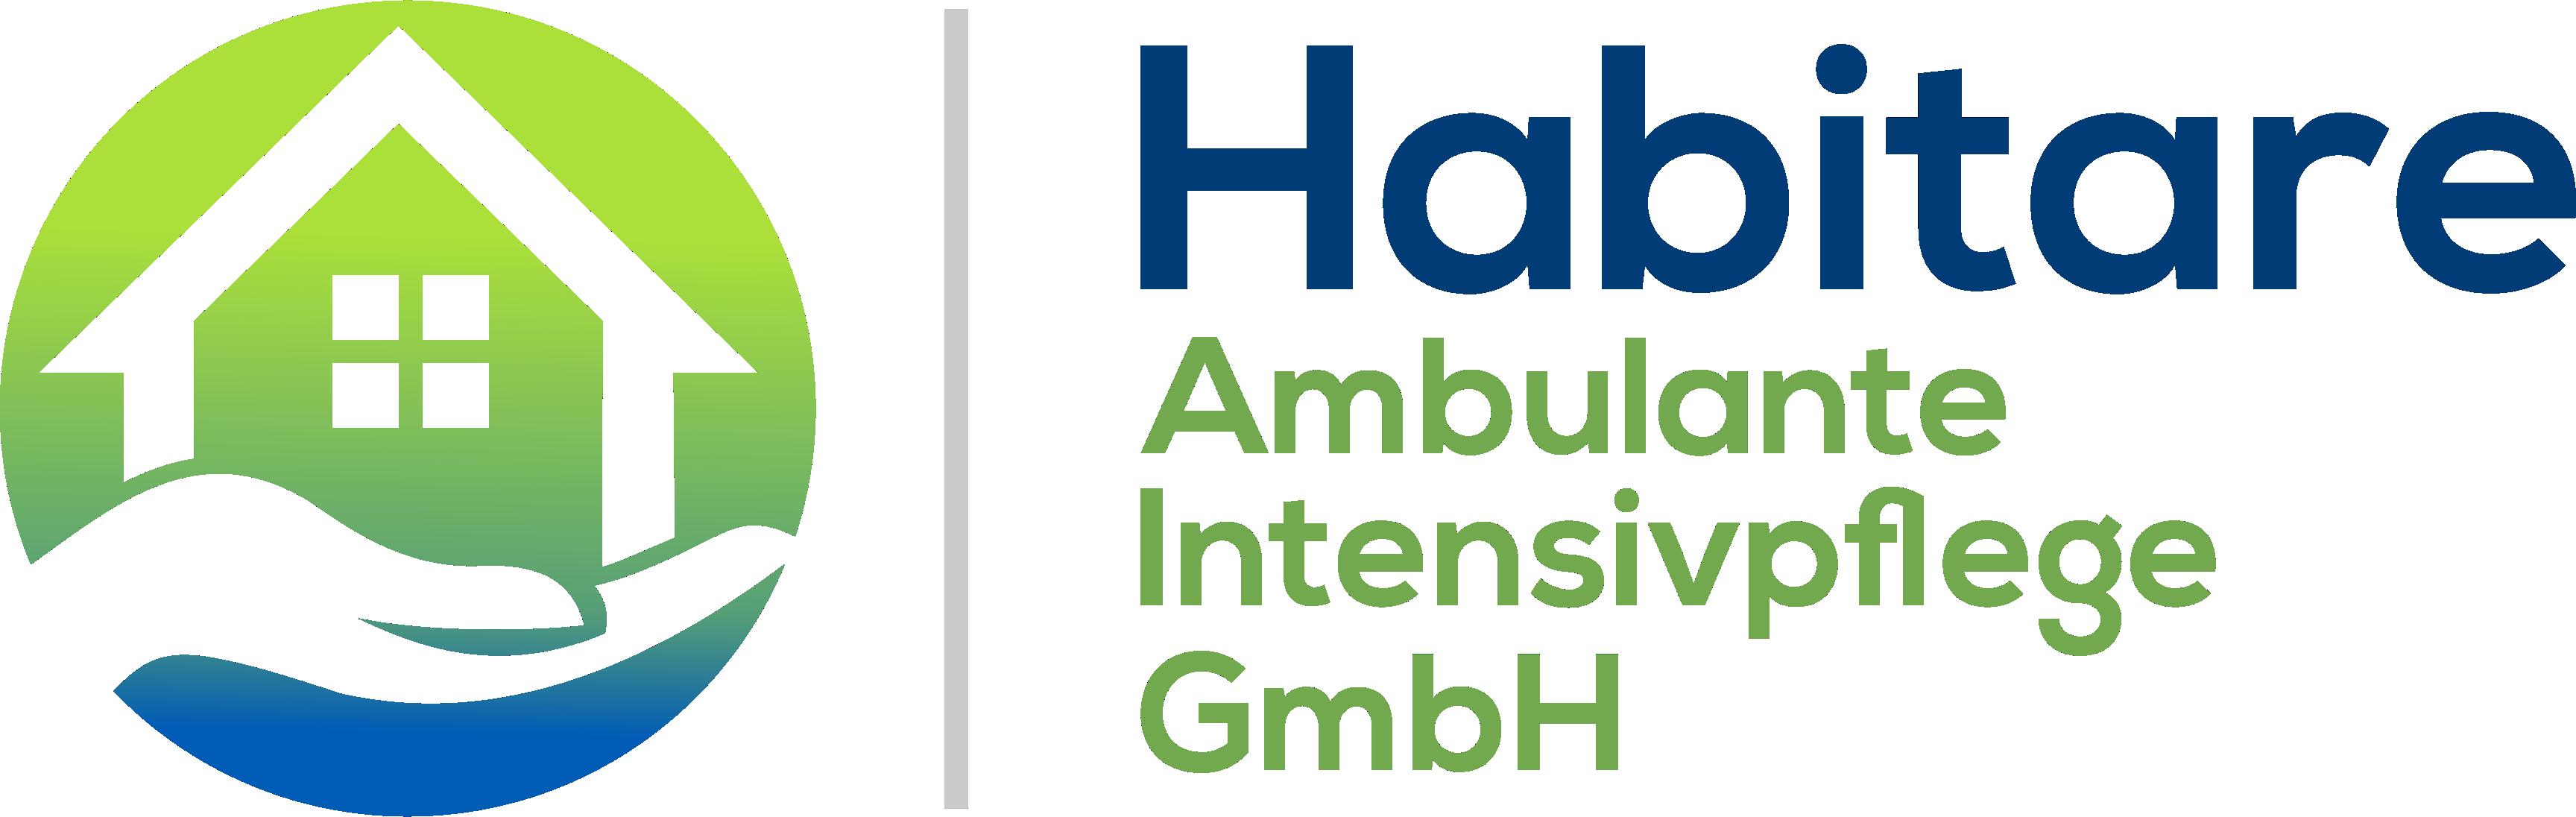 Habitare Ambulante Intensivpflege GmbH